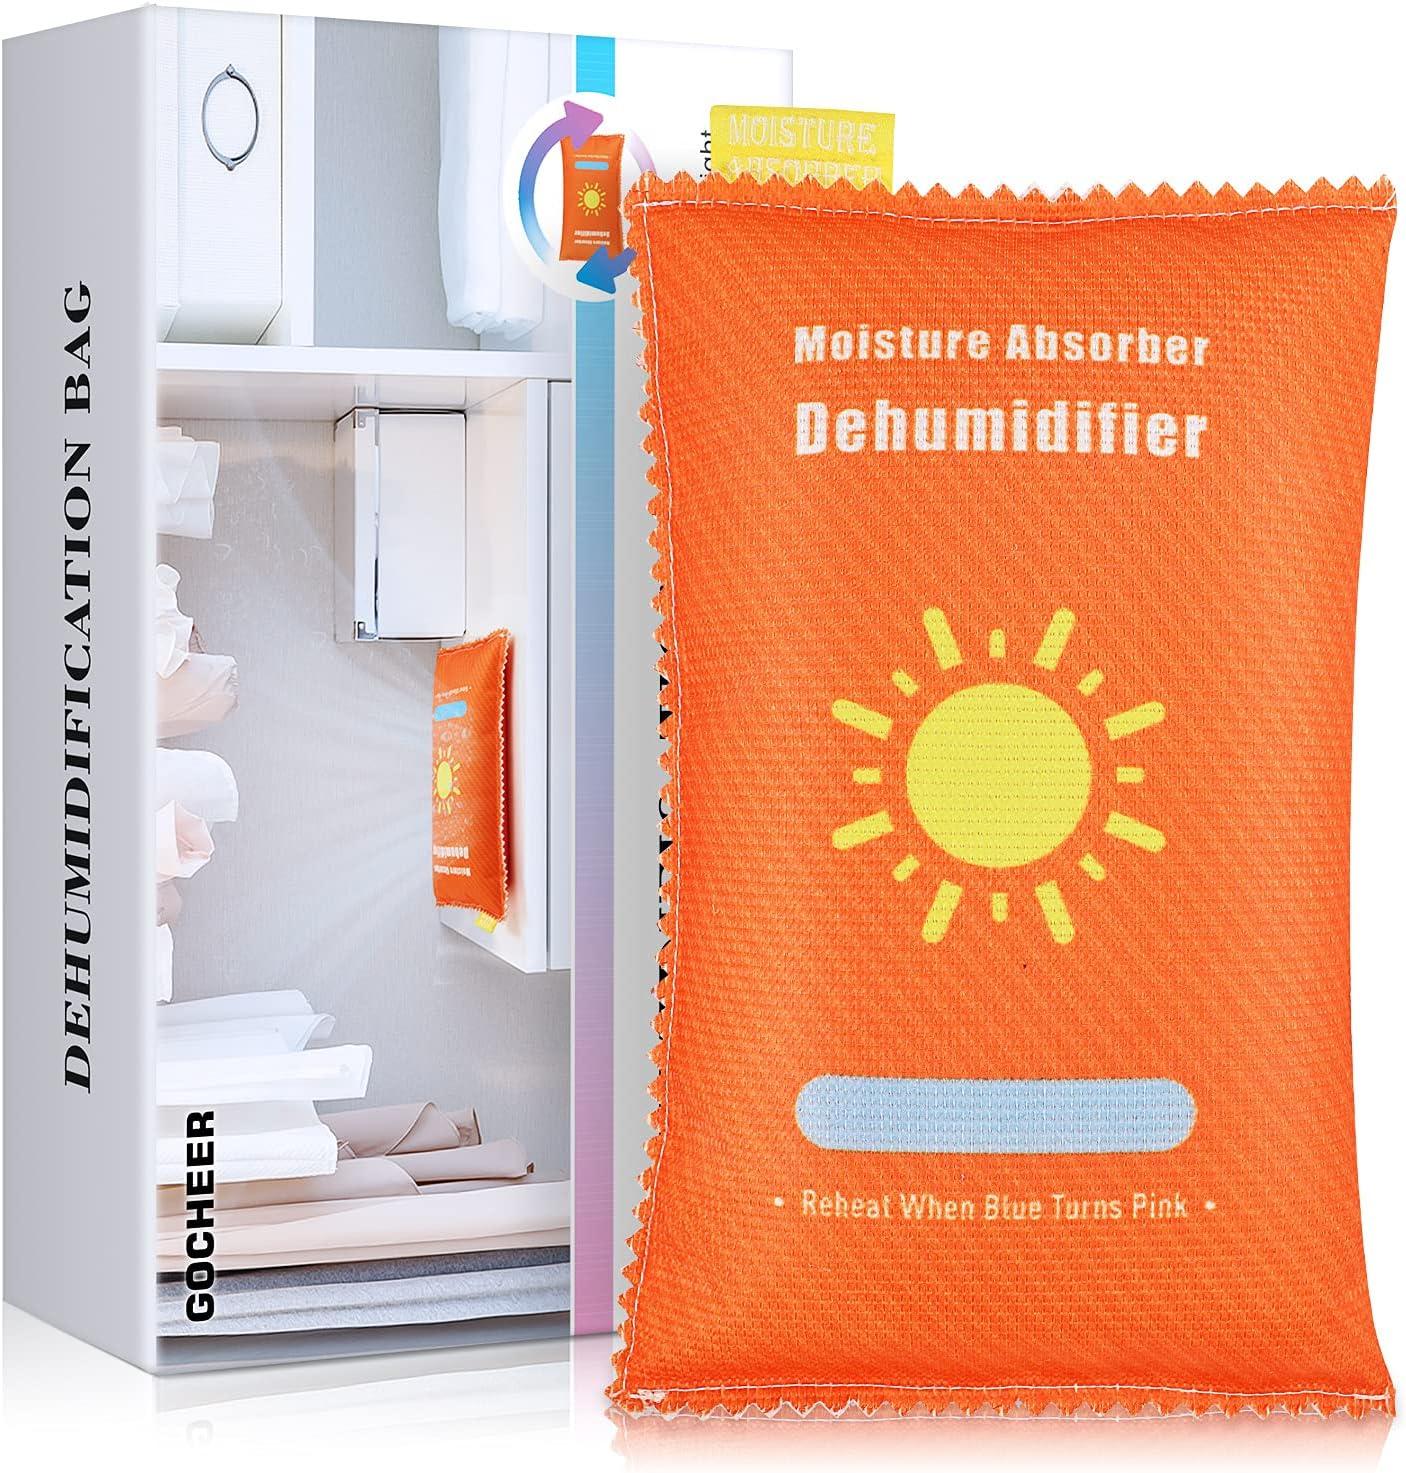 Gocheer Reusable Moisture Absorber fo Hangable Dehumidifier Charlotte Limited time cheap sale Mall Bag